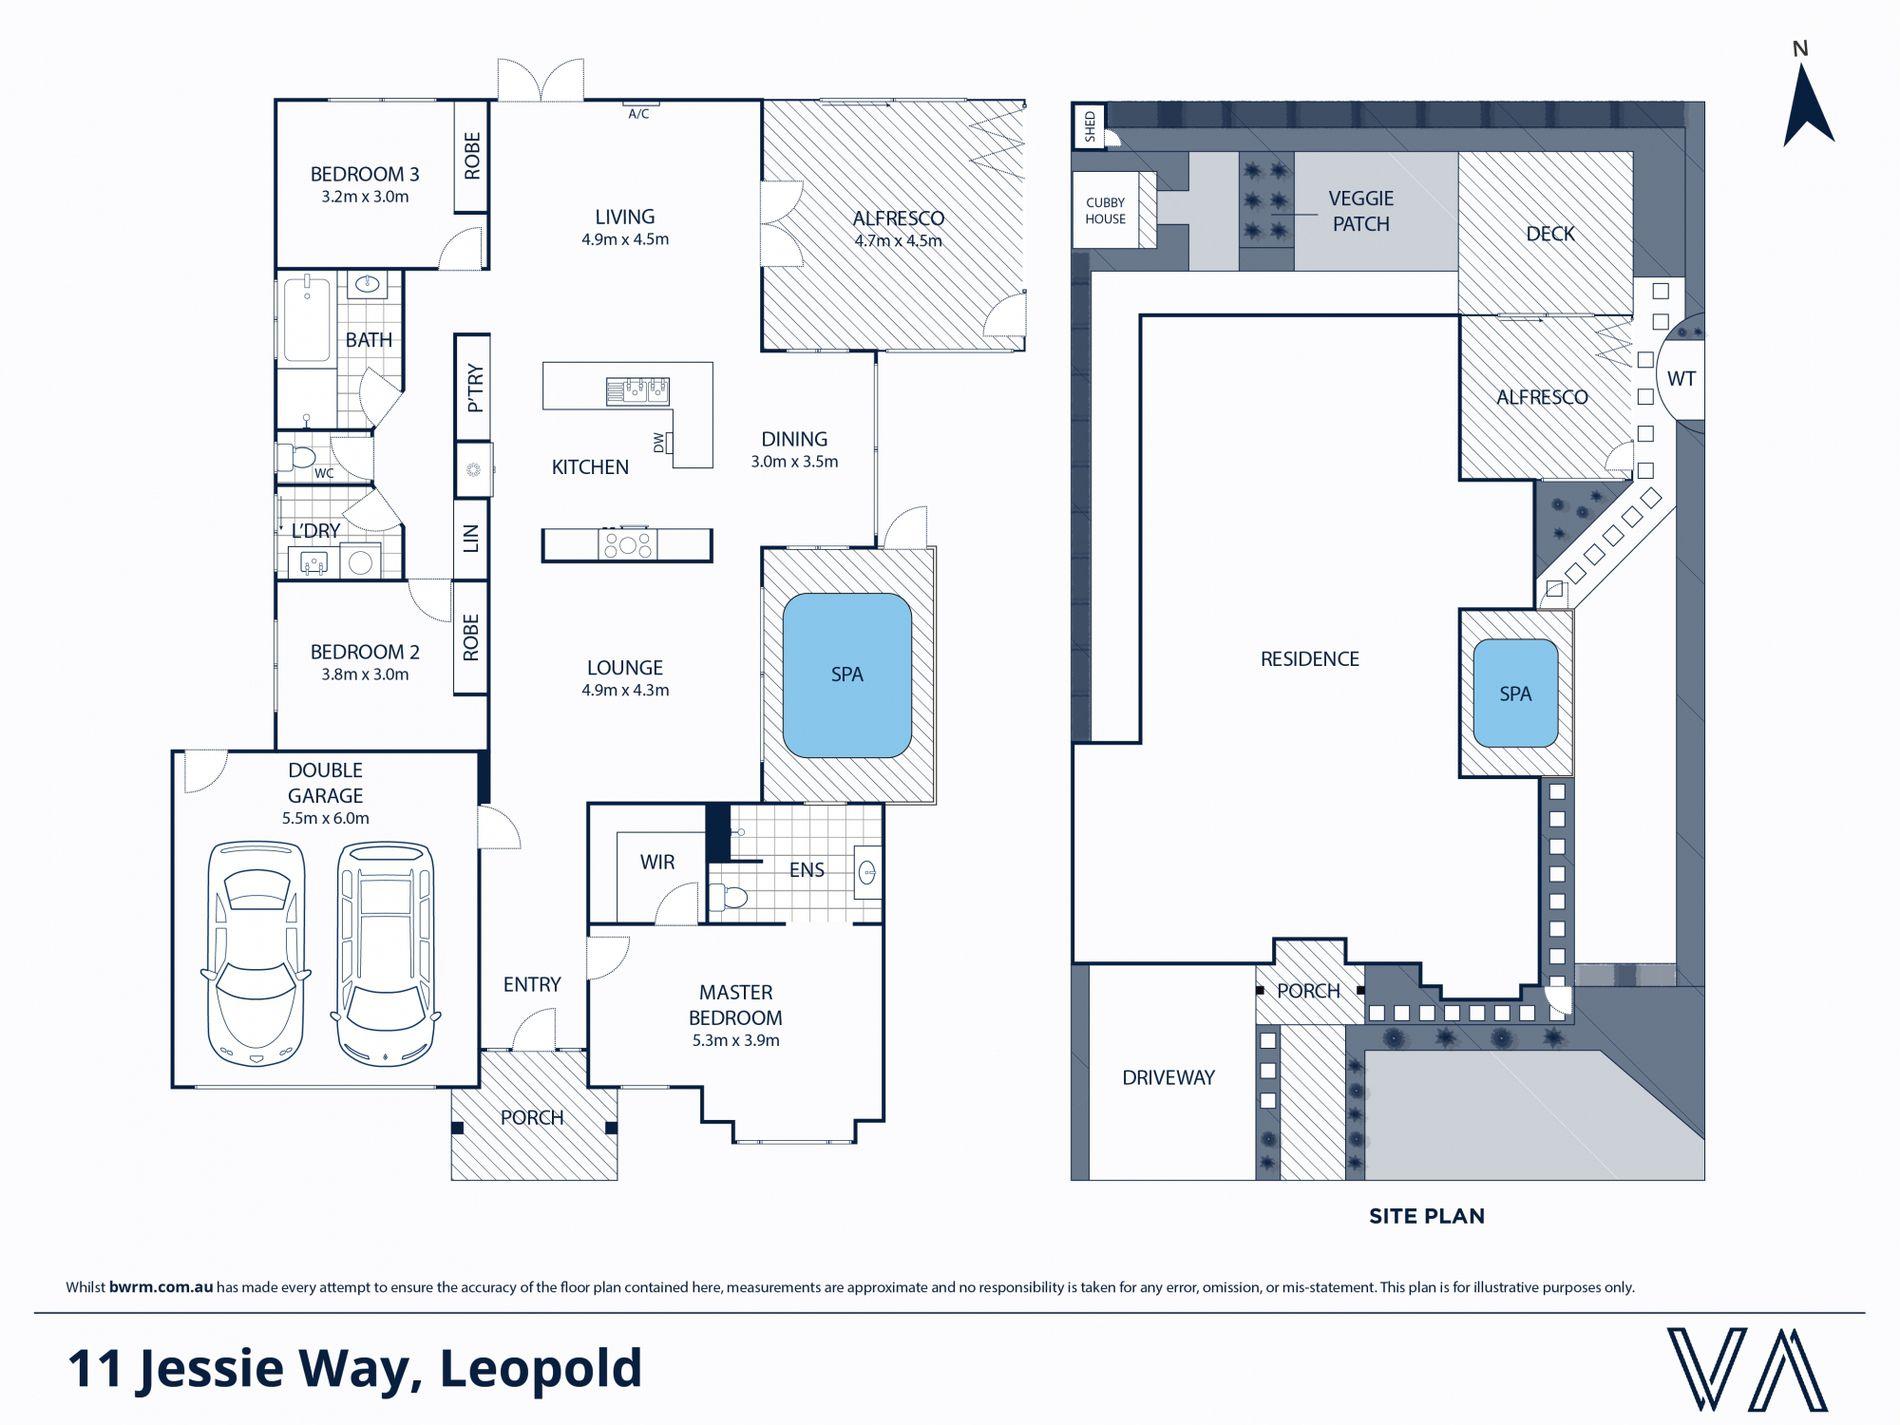 11 Jessie Way, Leopold